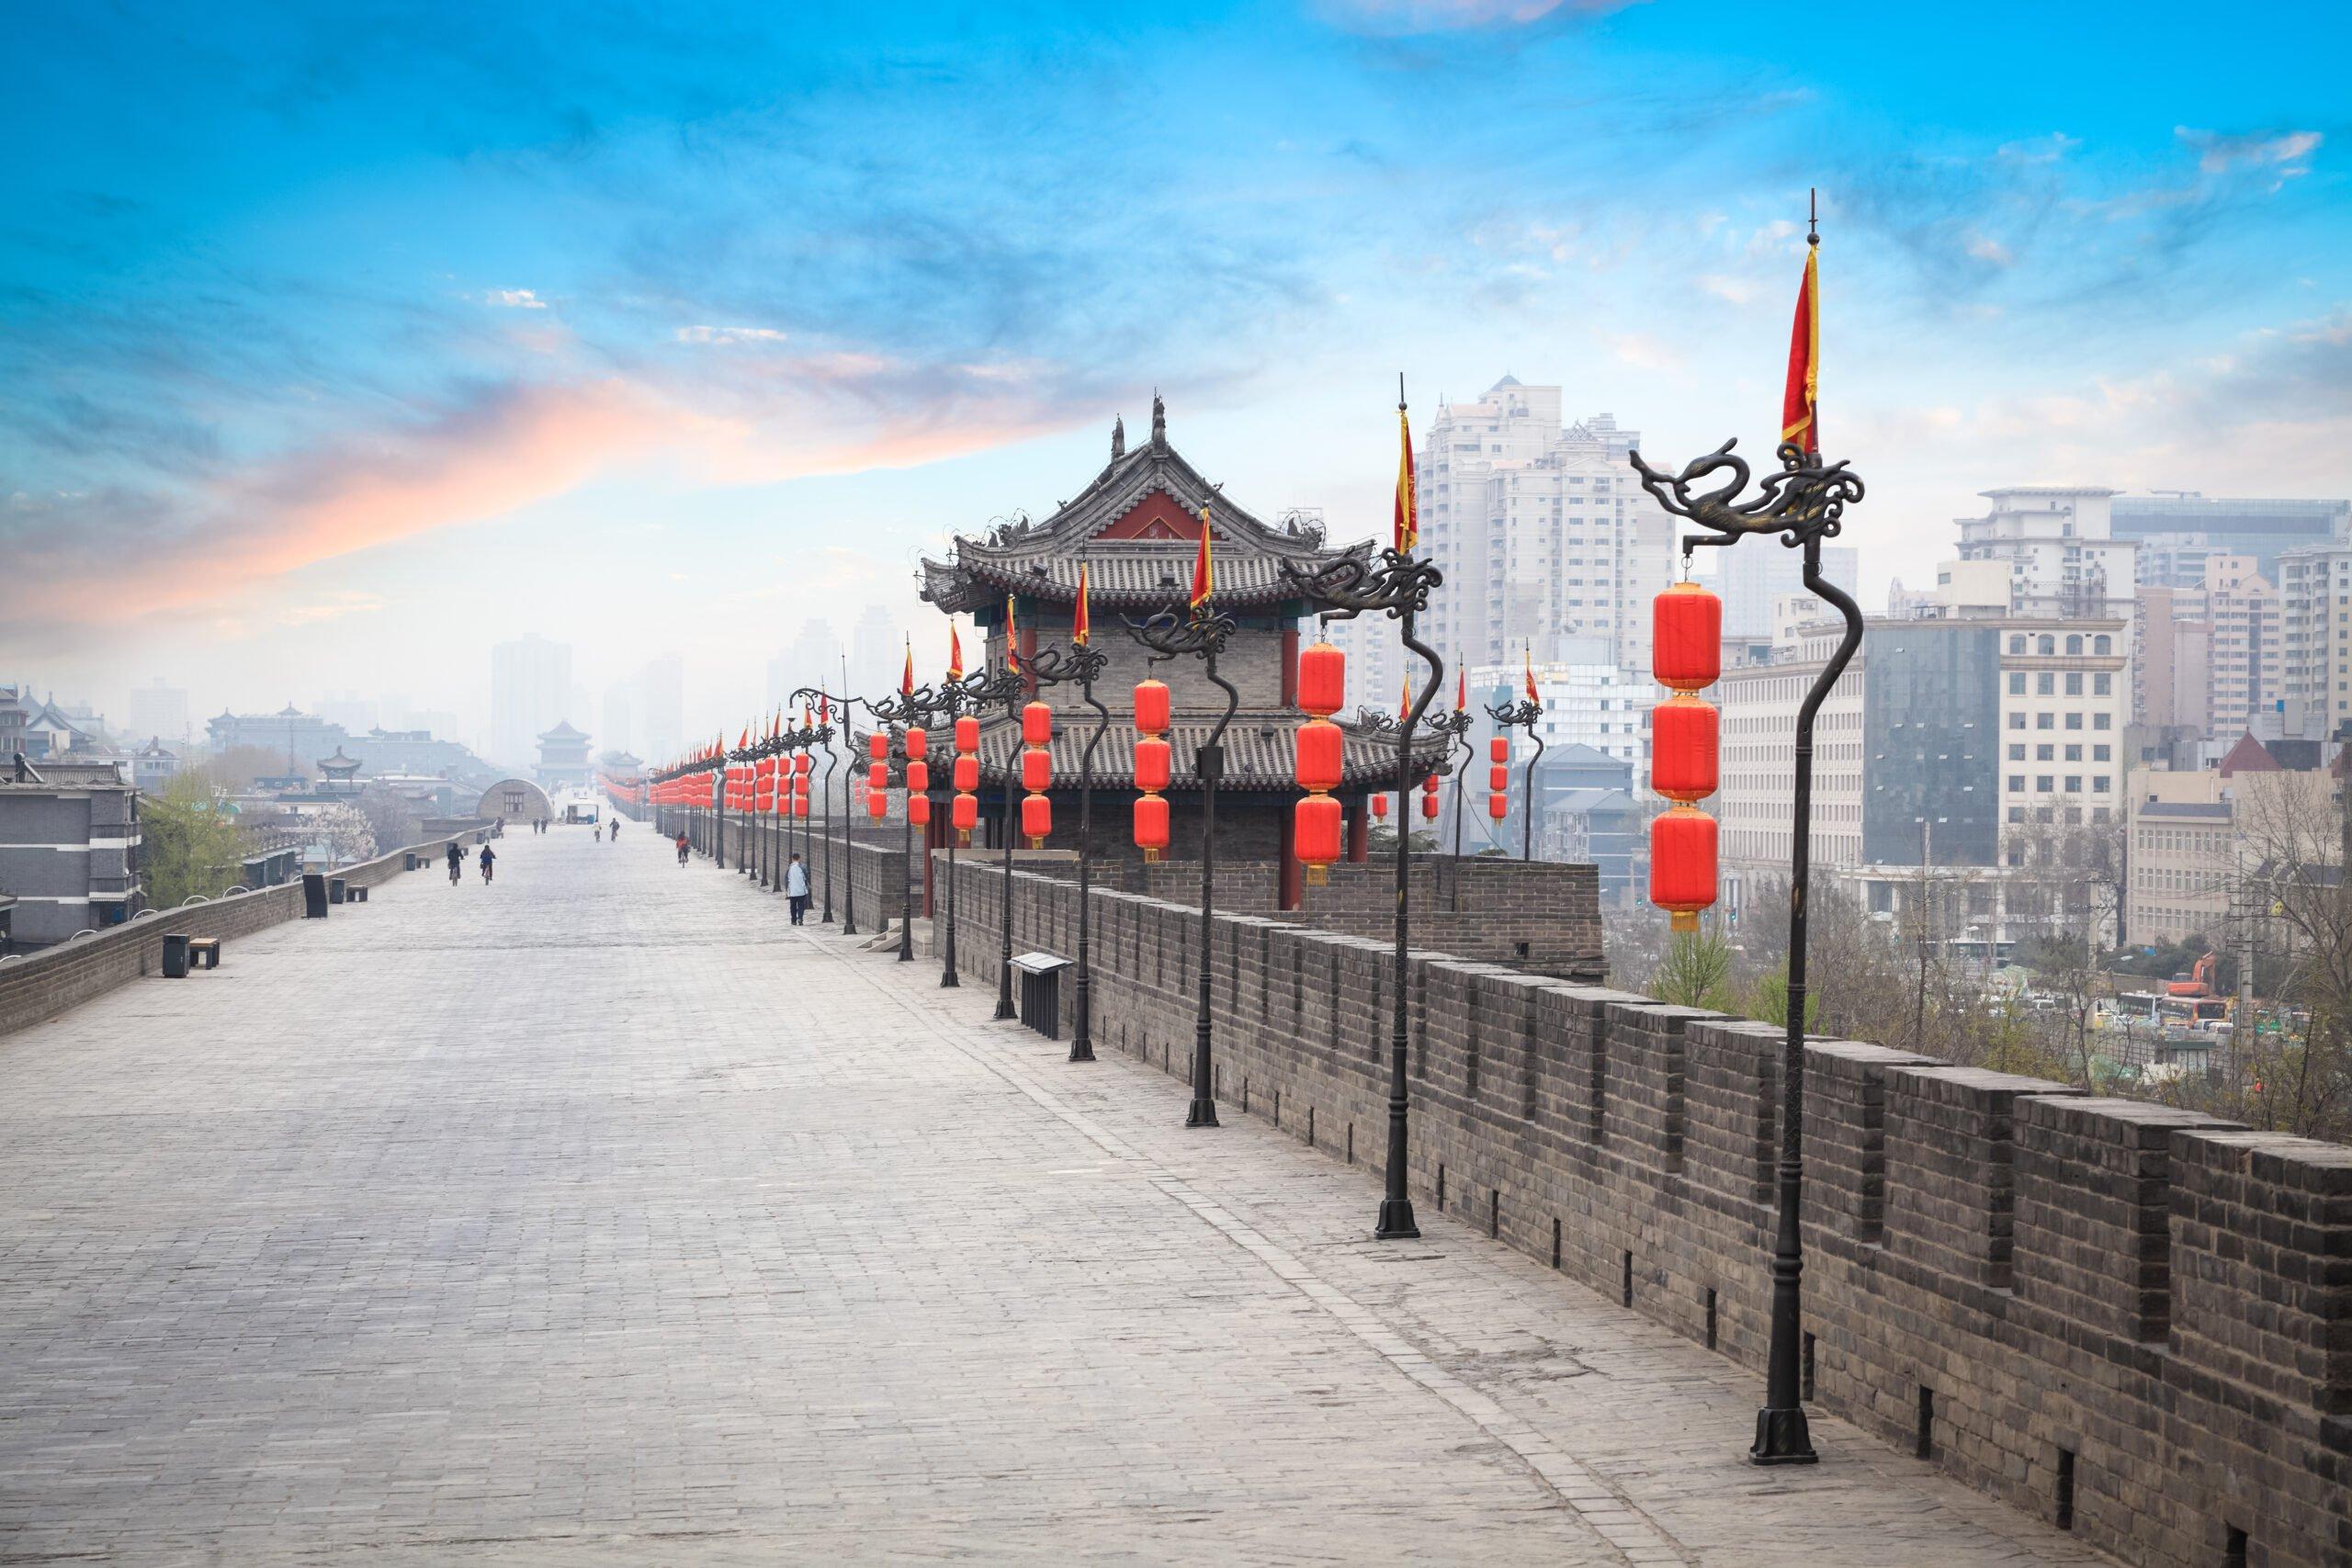 Xian Old City Wall